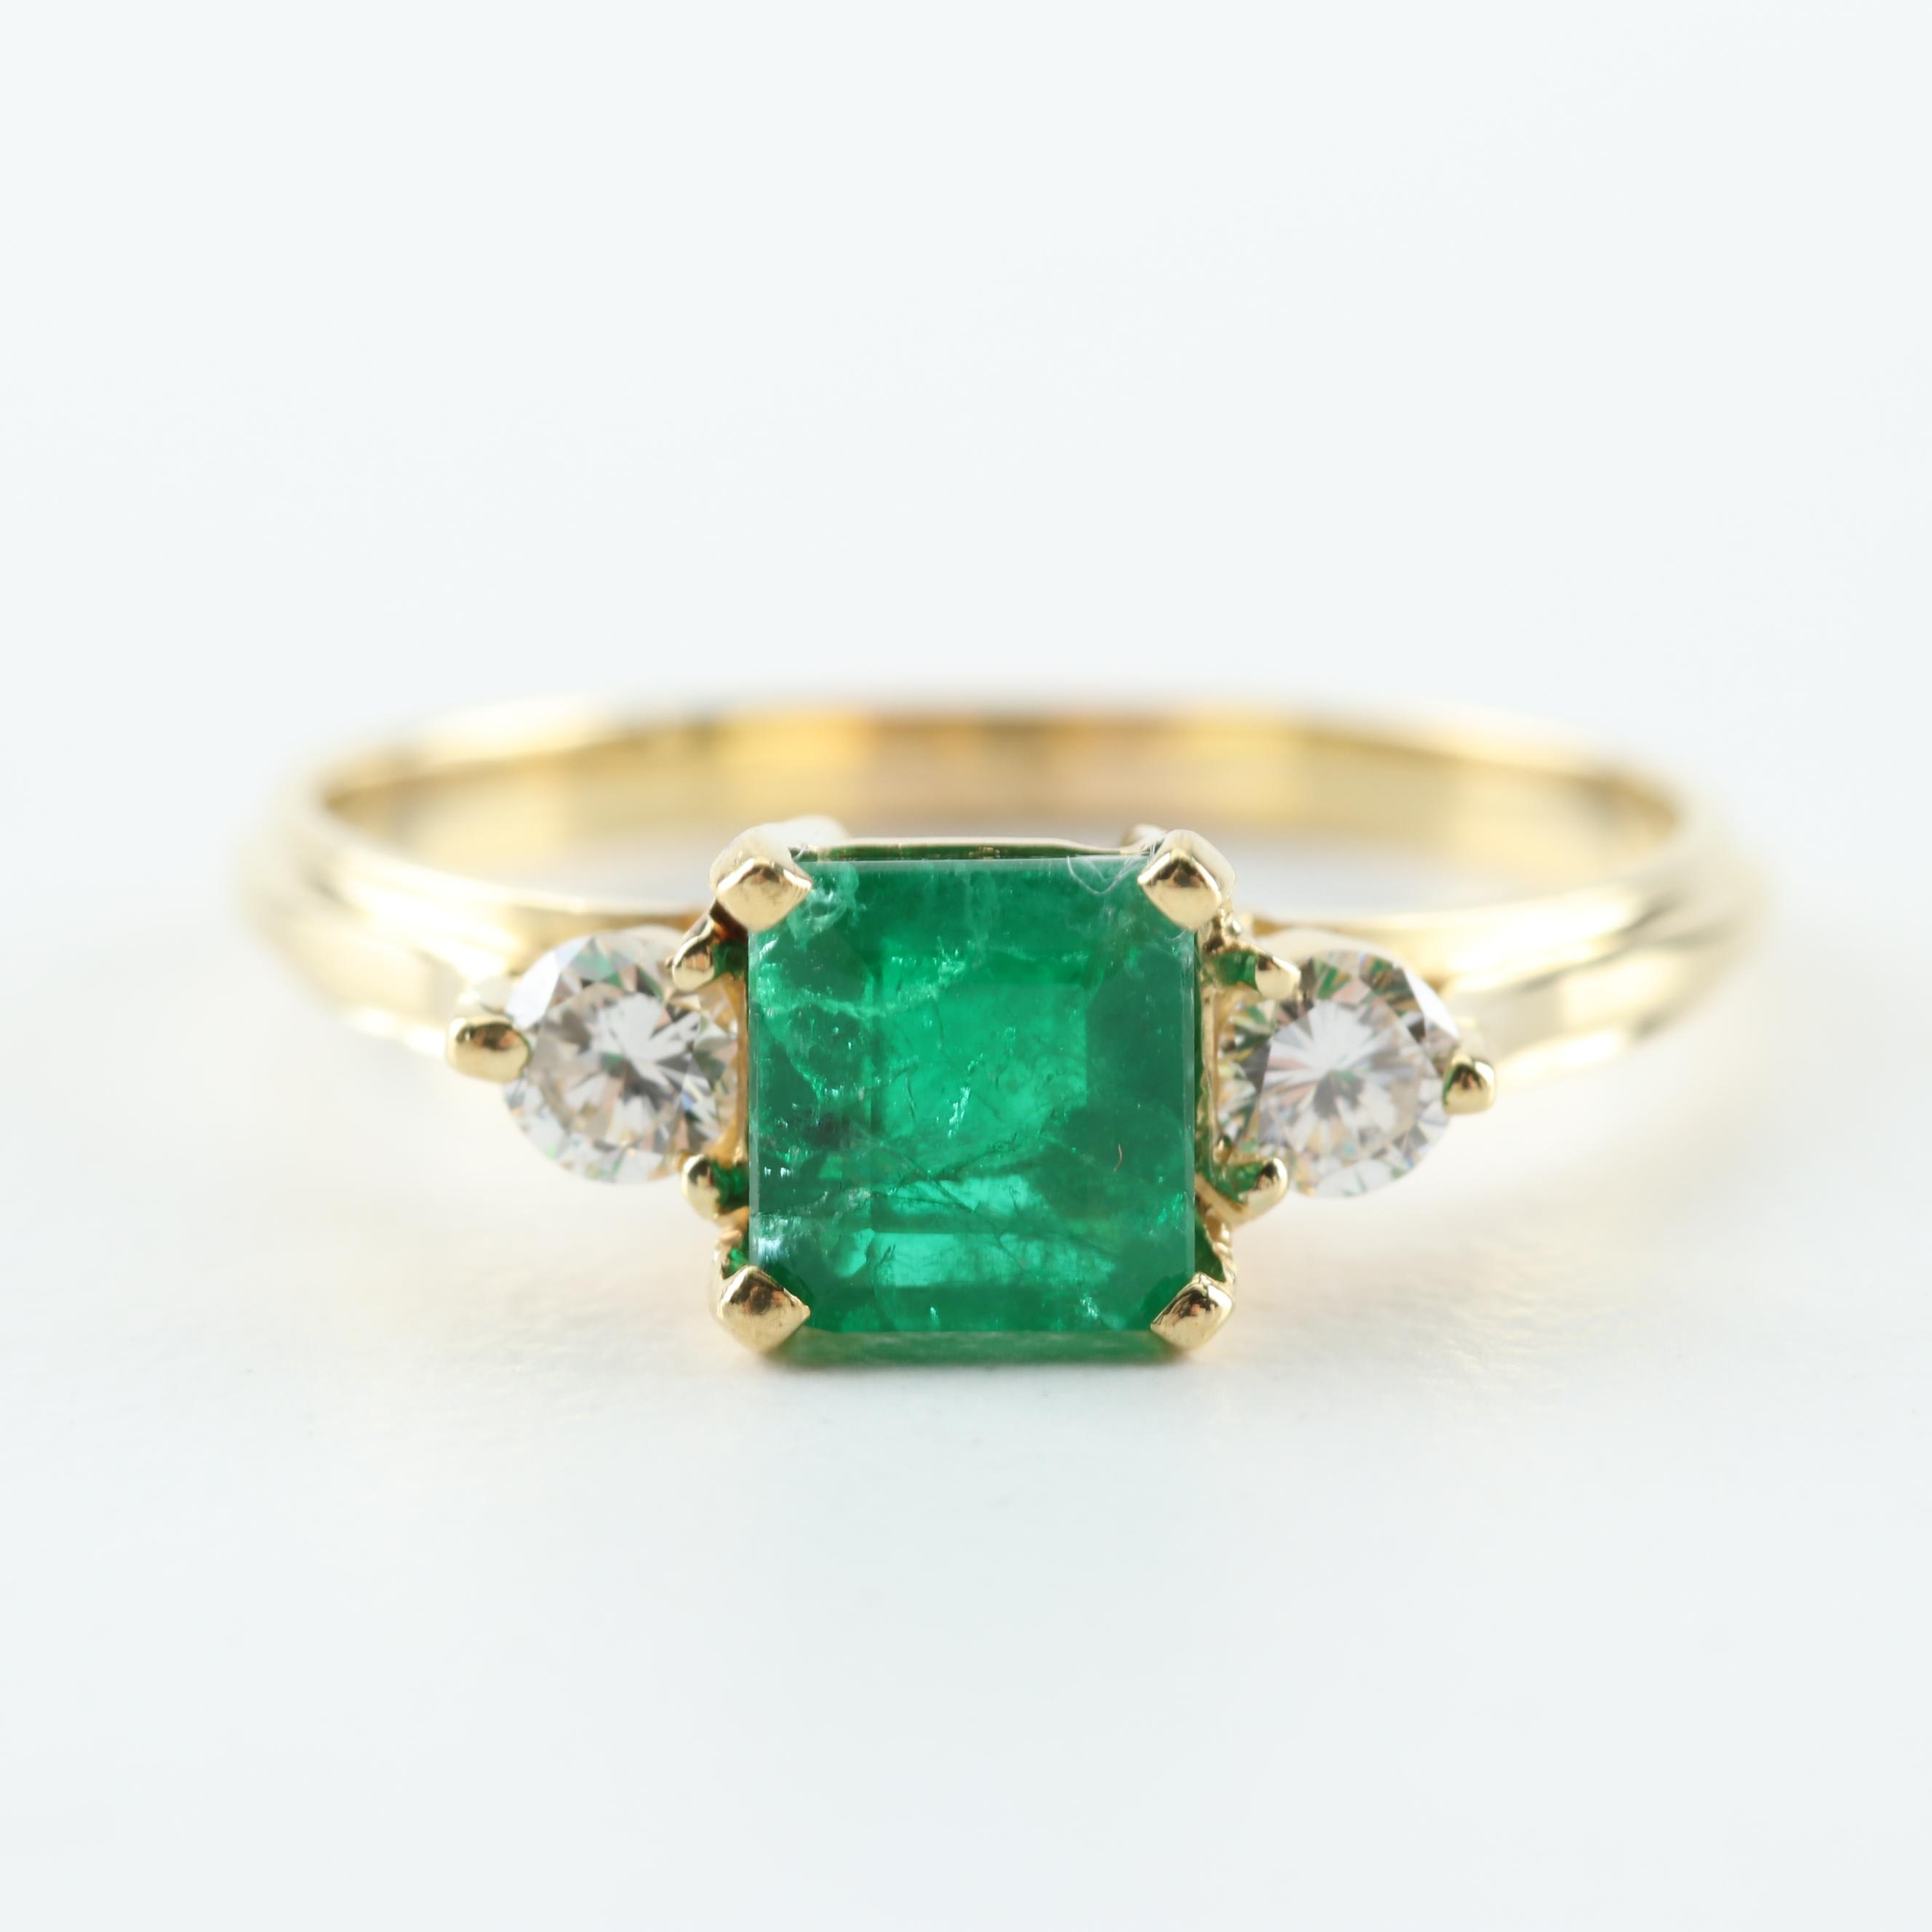 18K Yellow Gold, Emerald, and Diamond Ring